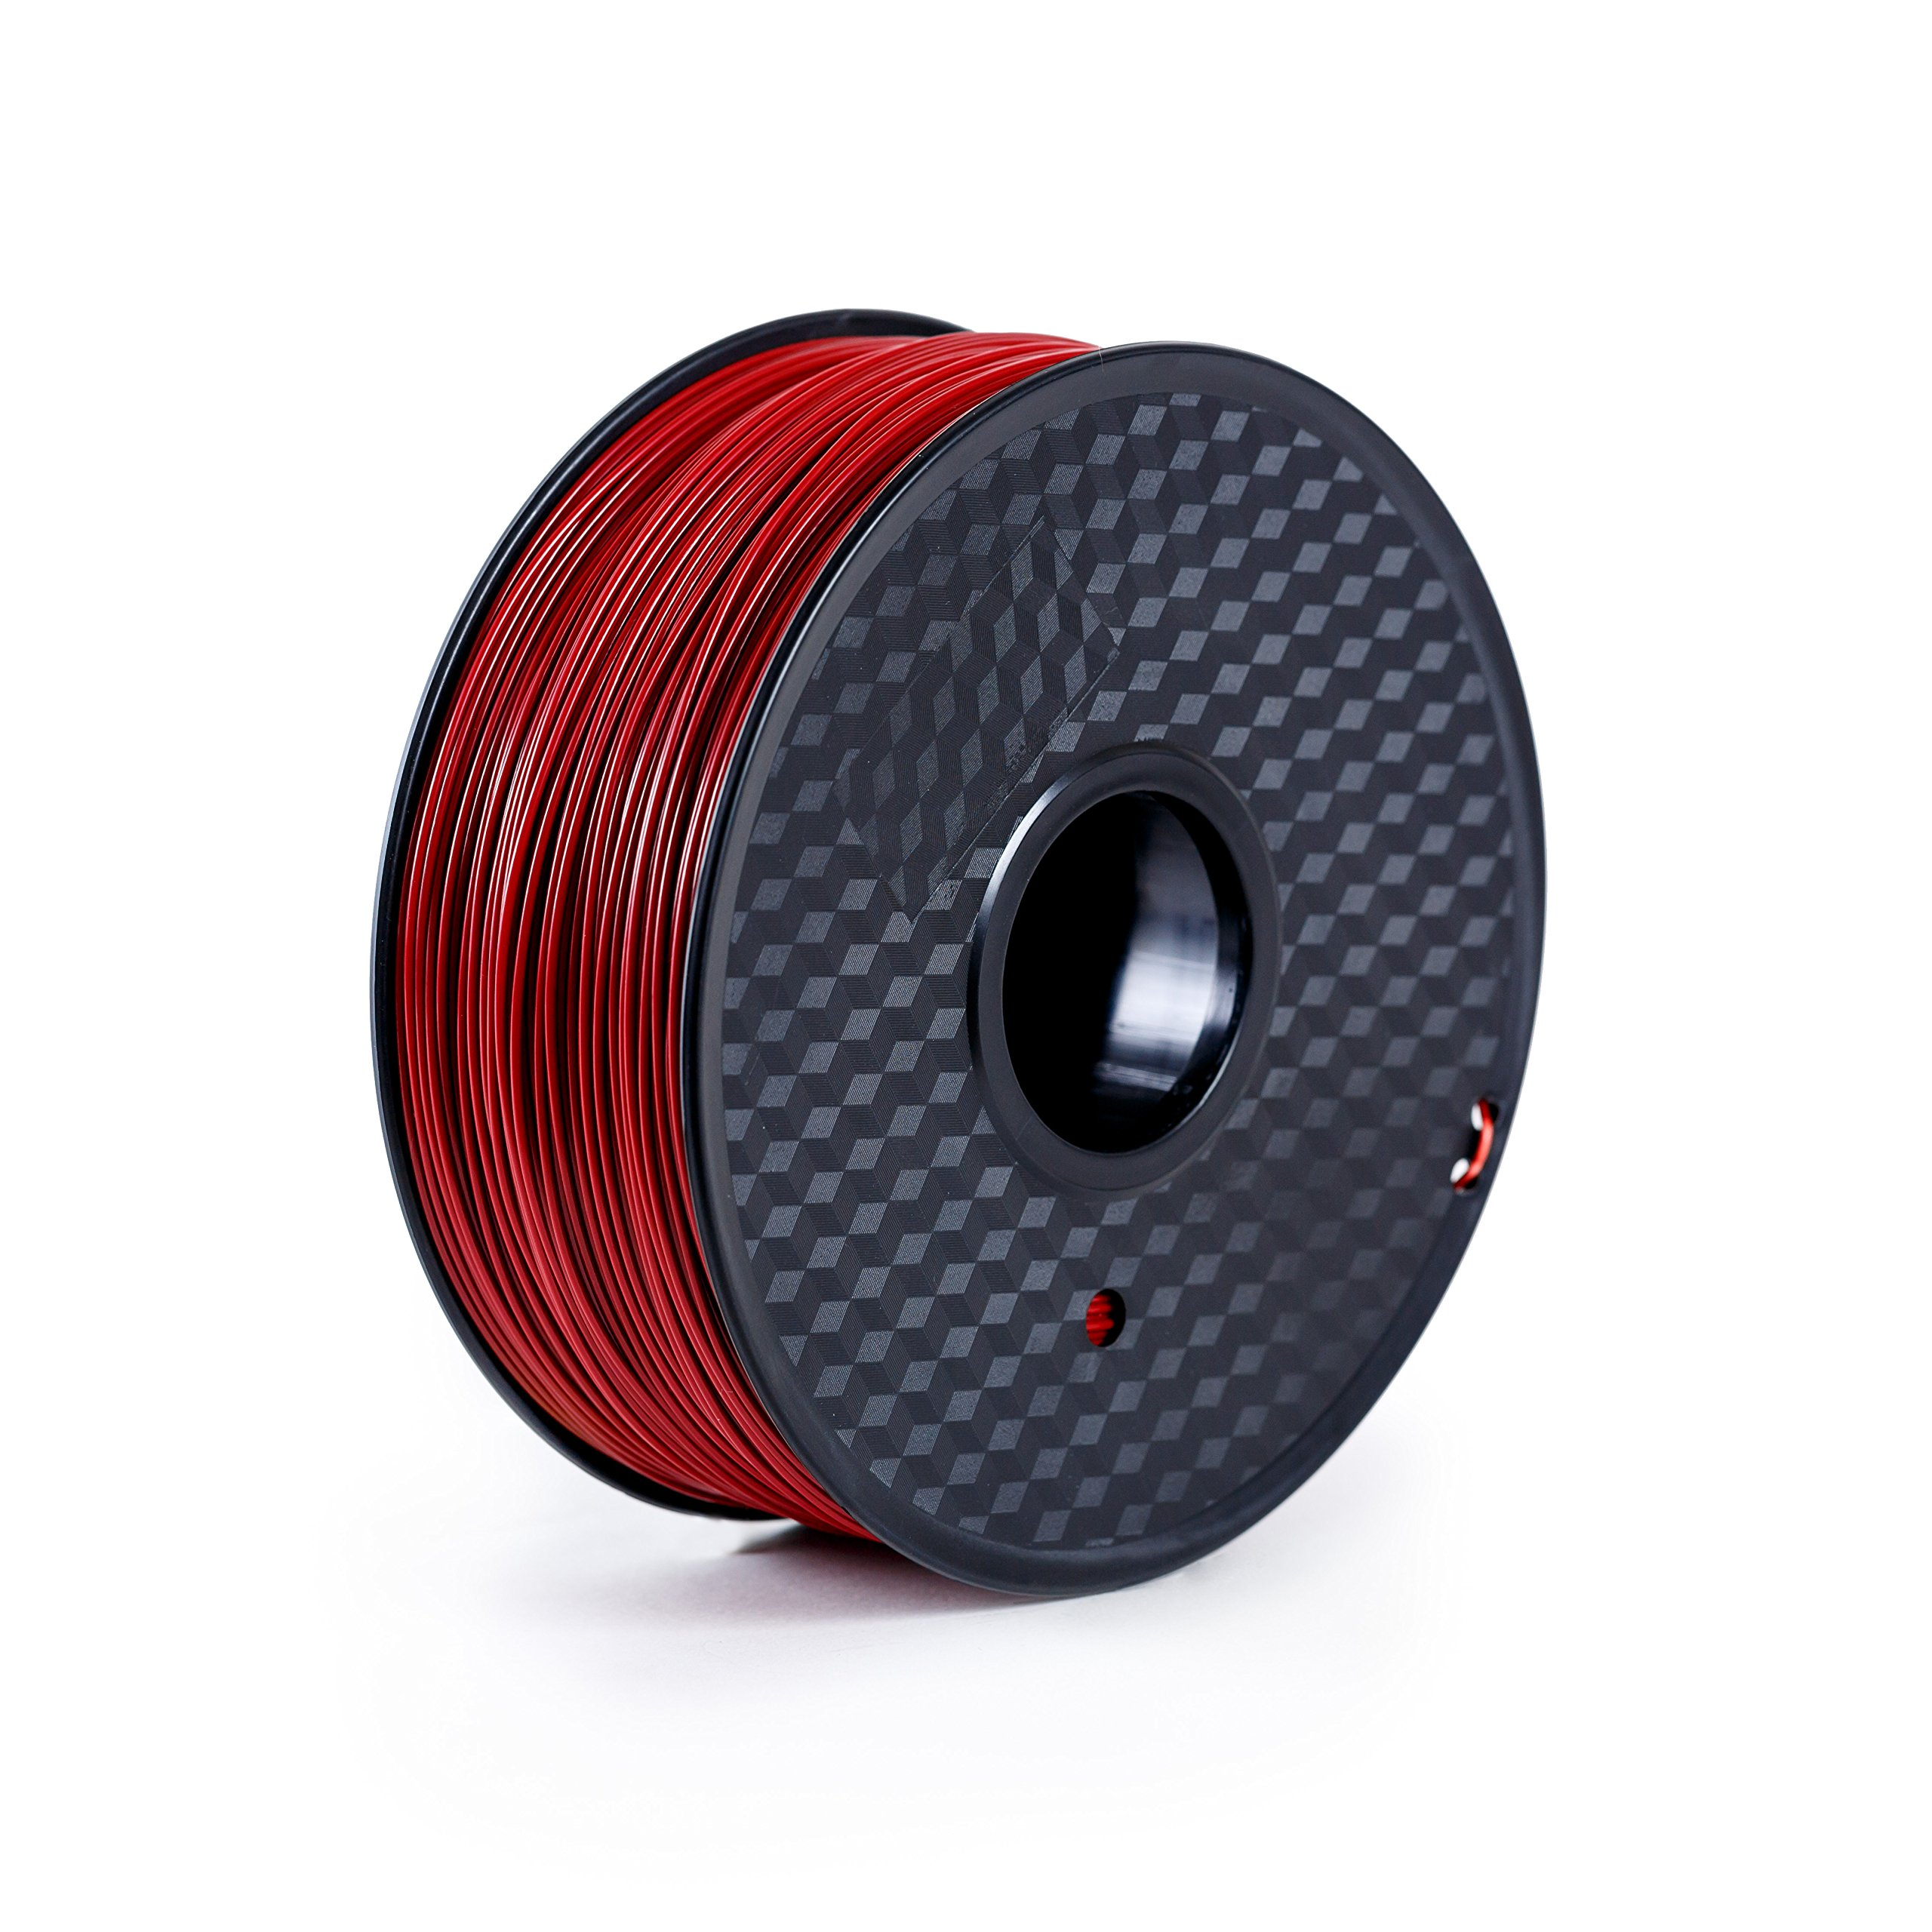 Paramount 3D PLA (PANTONE Iron Red 1815C) 1.75mm 1kg Filament [IRRL30111815C]